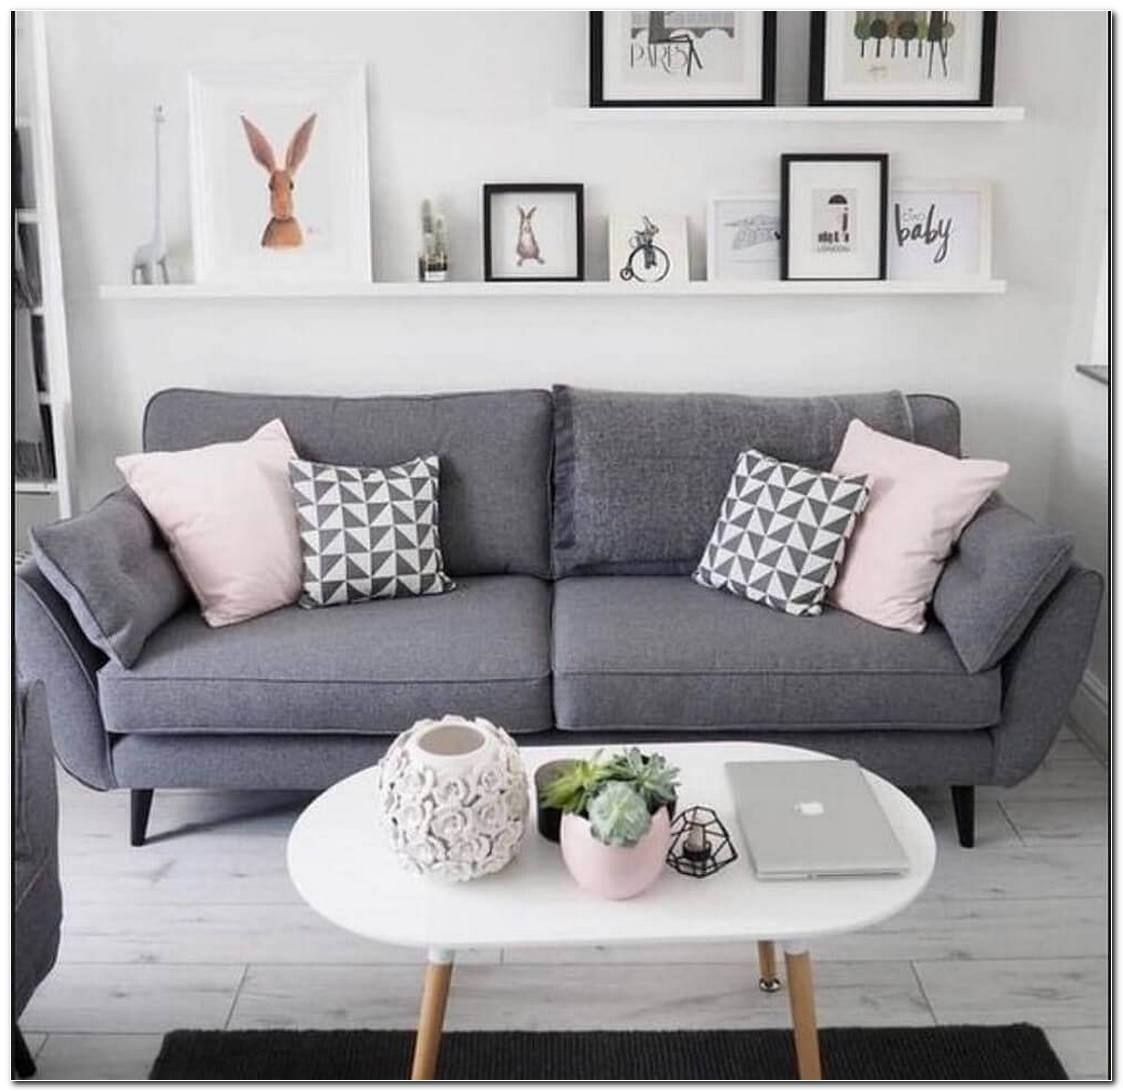 60 Sofás Pequenos Para Salas De Estar Fotos Lindas